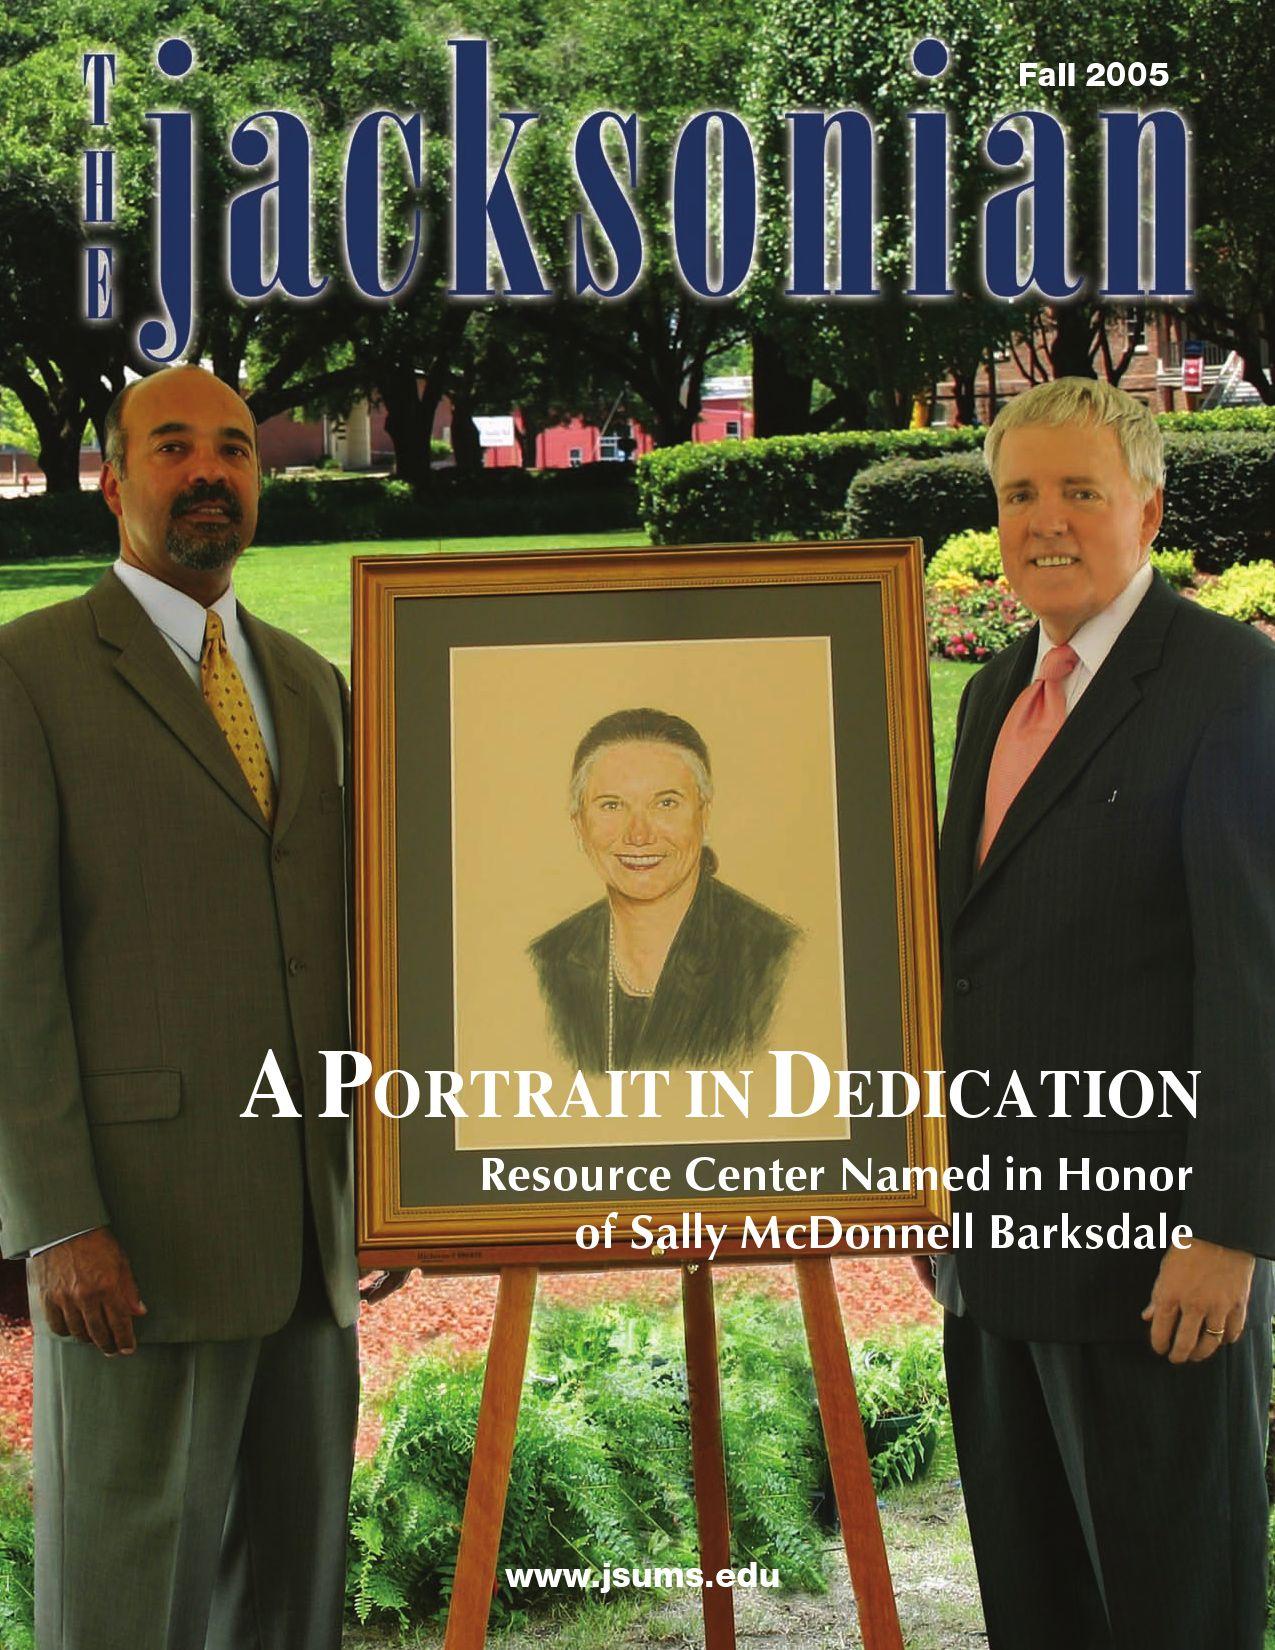 Jacksonian 2005 by Jackson State University - Issuu